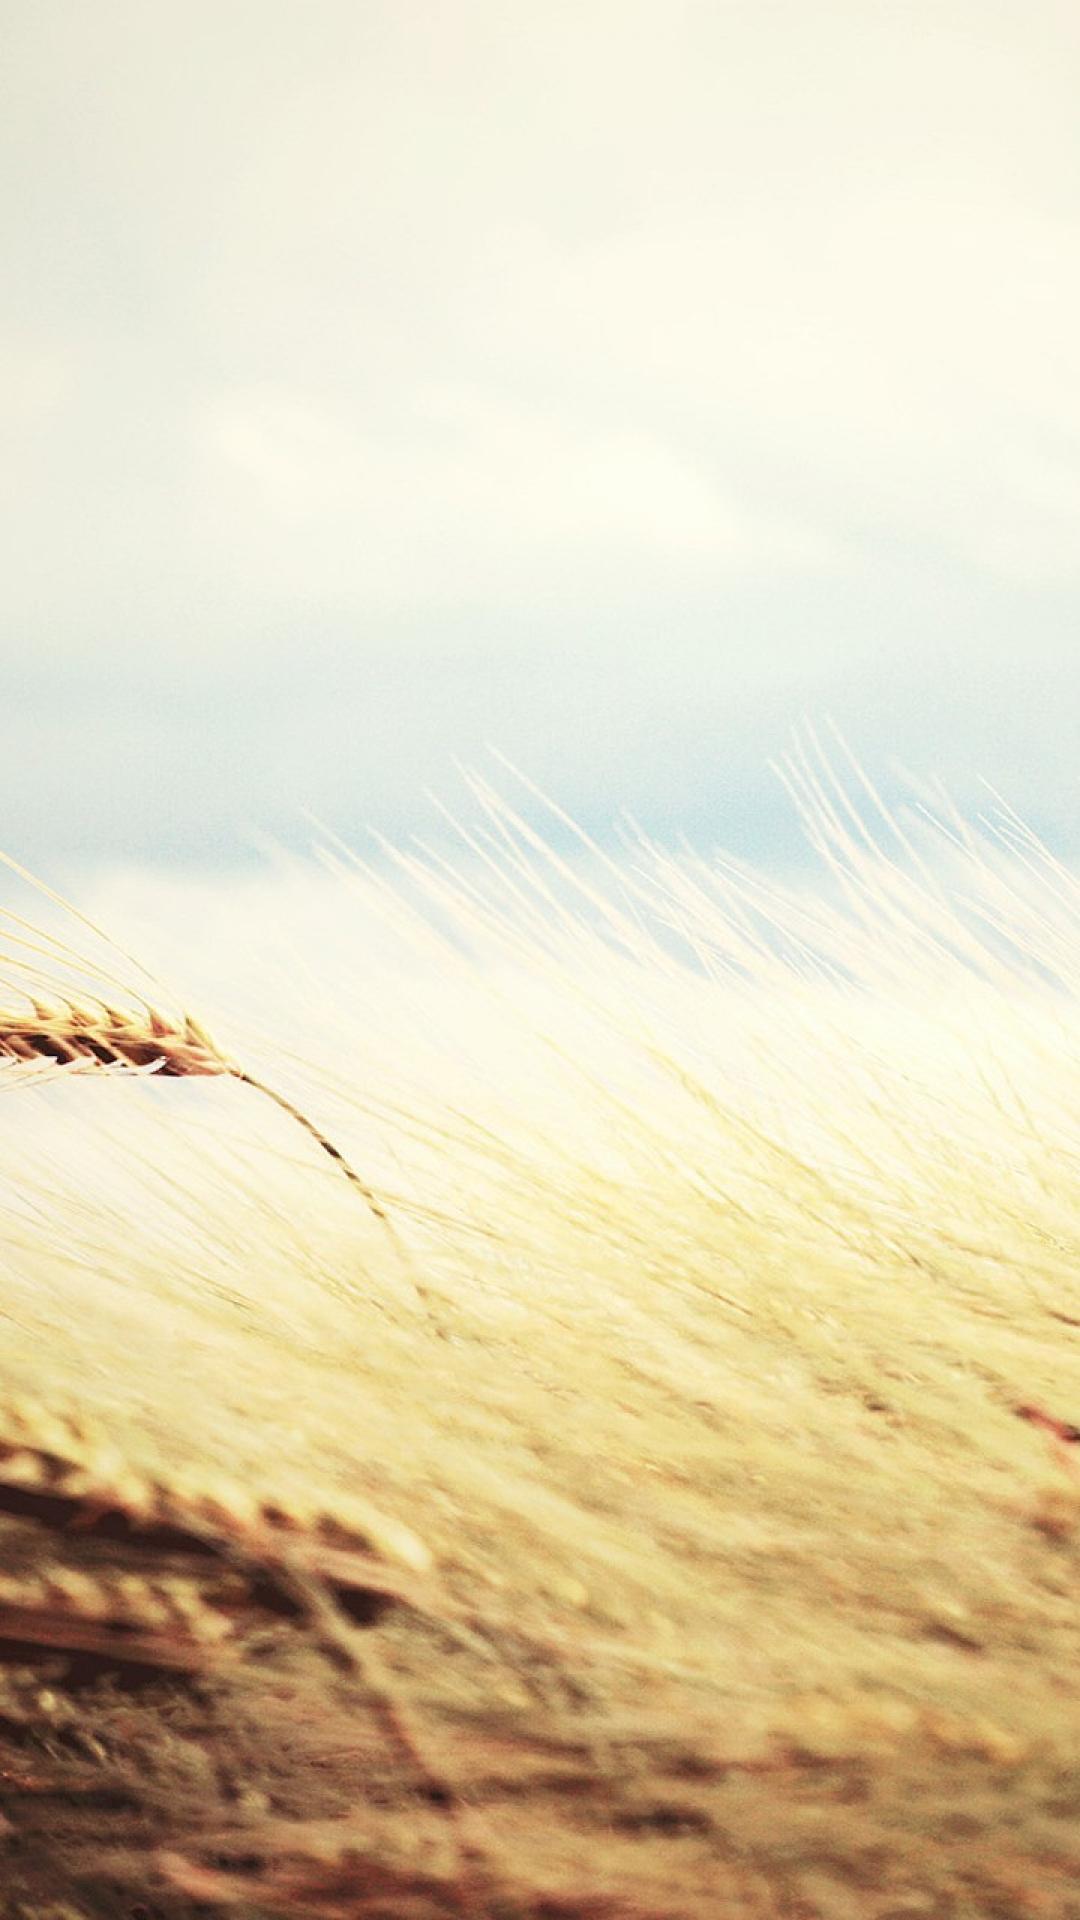 yellow fields wheat 982331 1080x1920